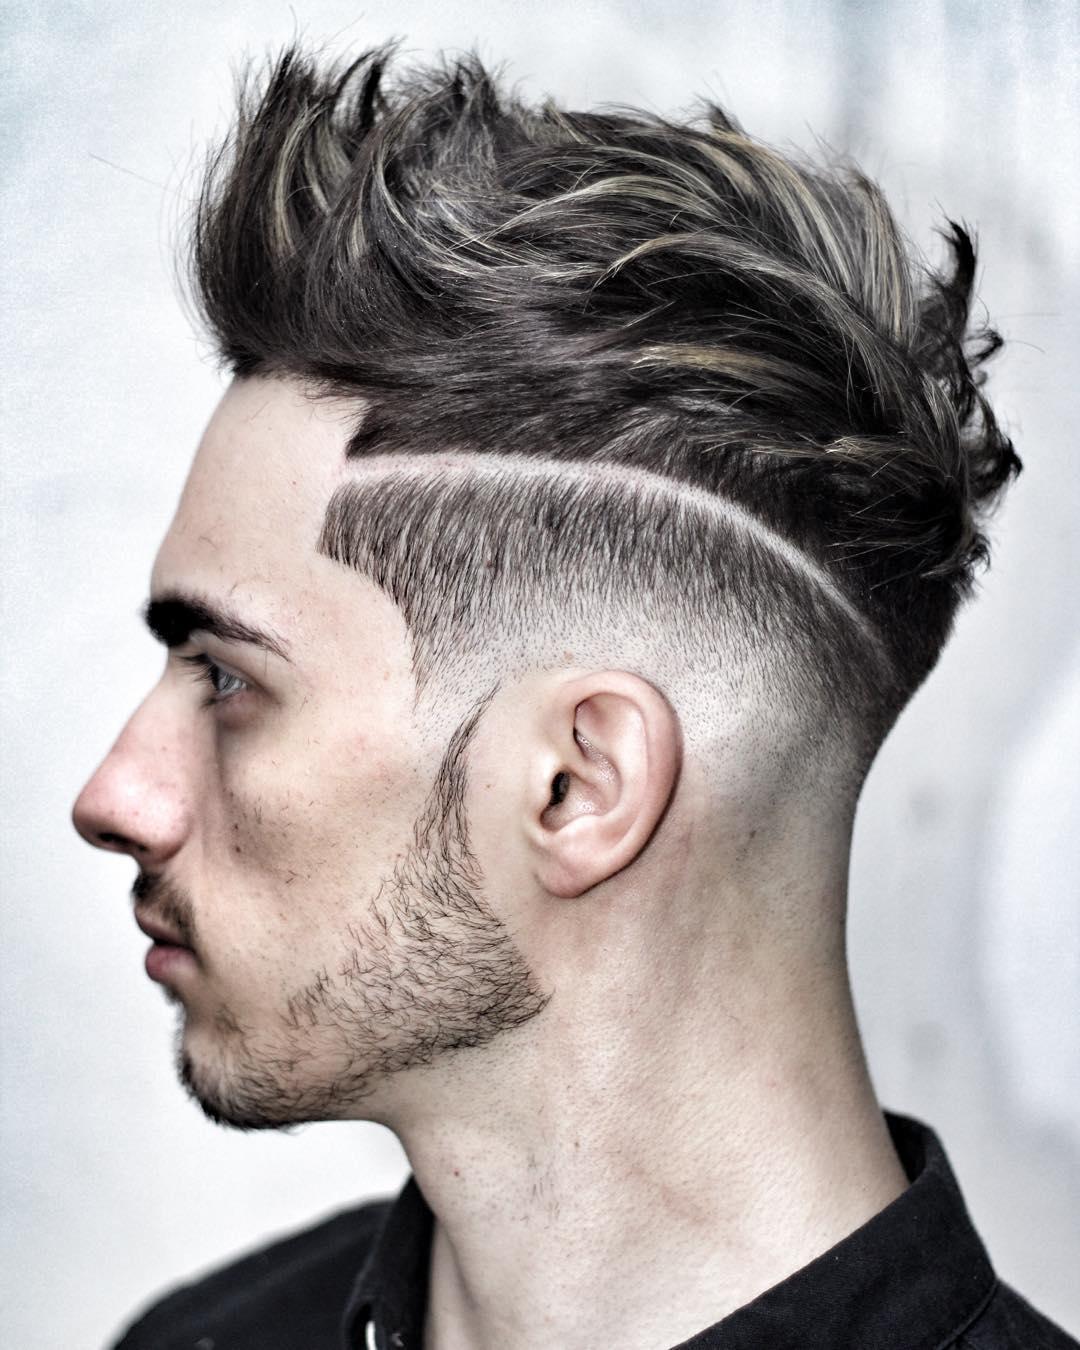 Pleasing Textured Hairstyles For Men 2017 Short Hairstyles For Black Women Fulllsitofus